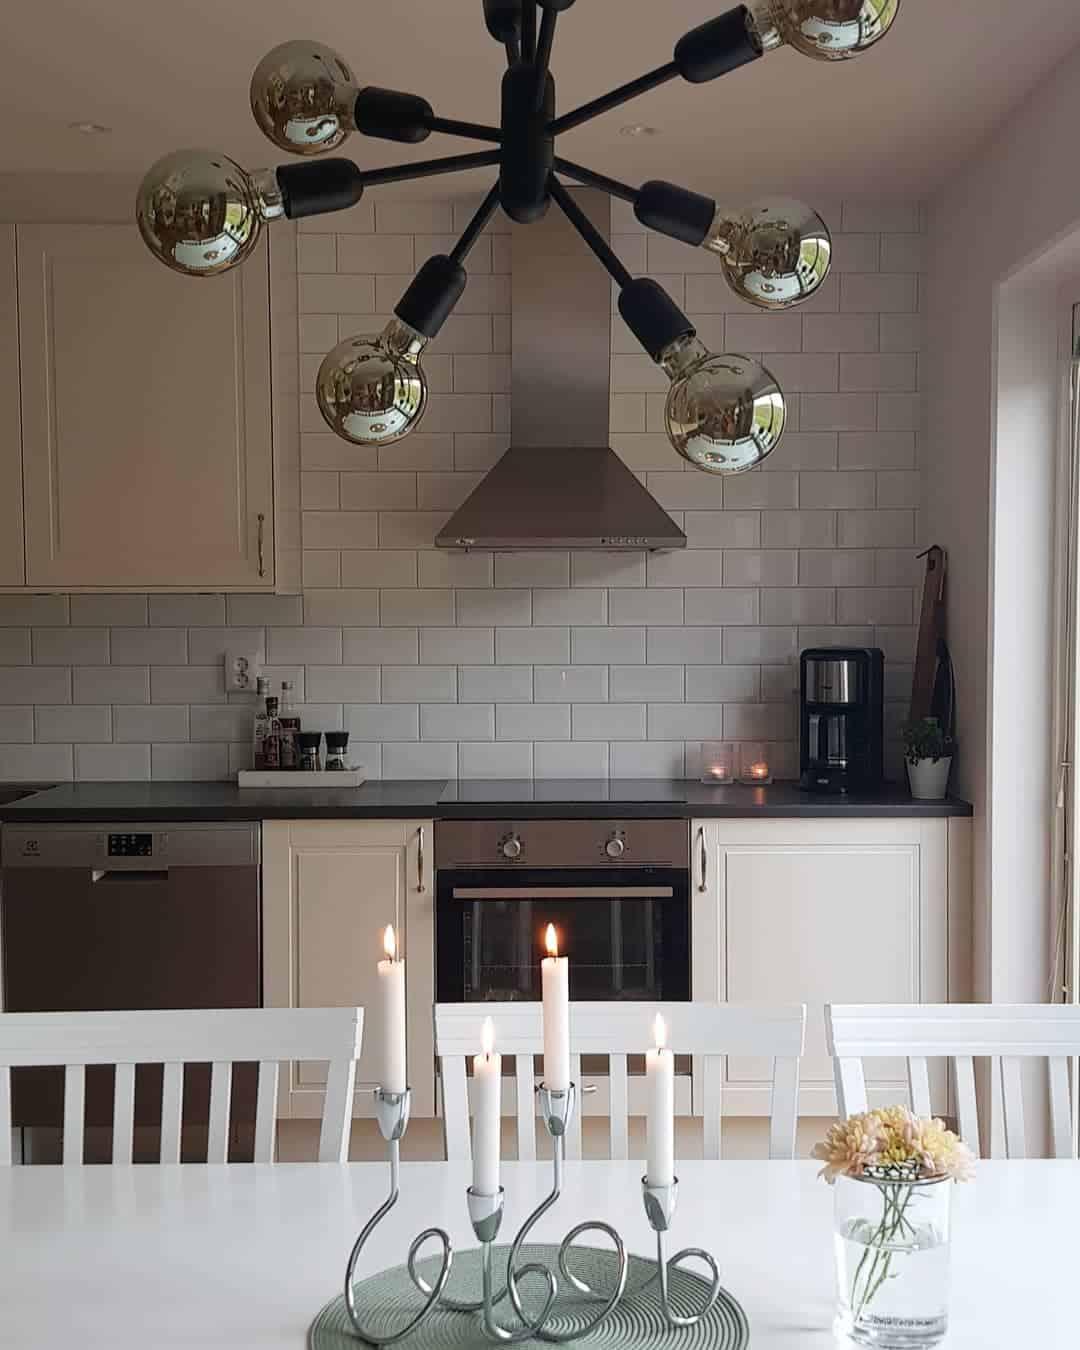 Modern Kitchens 2020: Cottage Style Kitchen Ideas (35 Photos